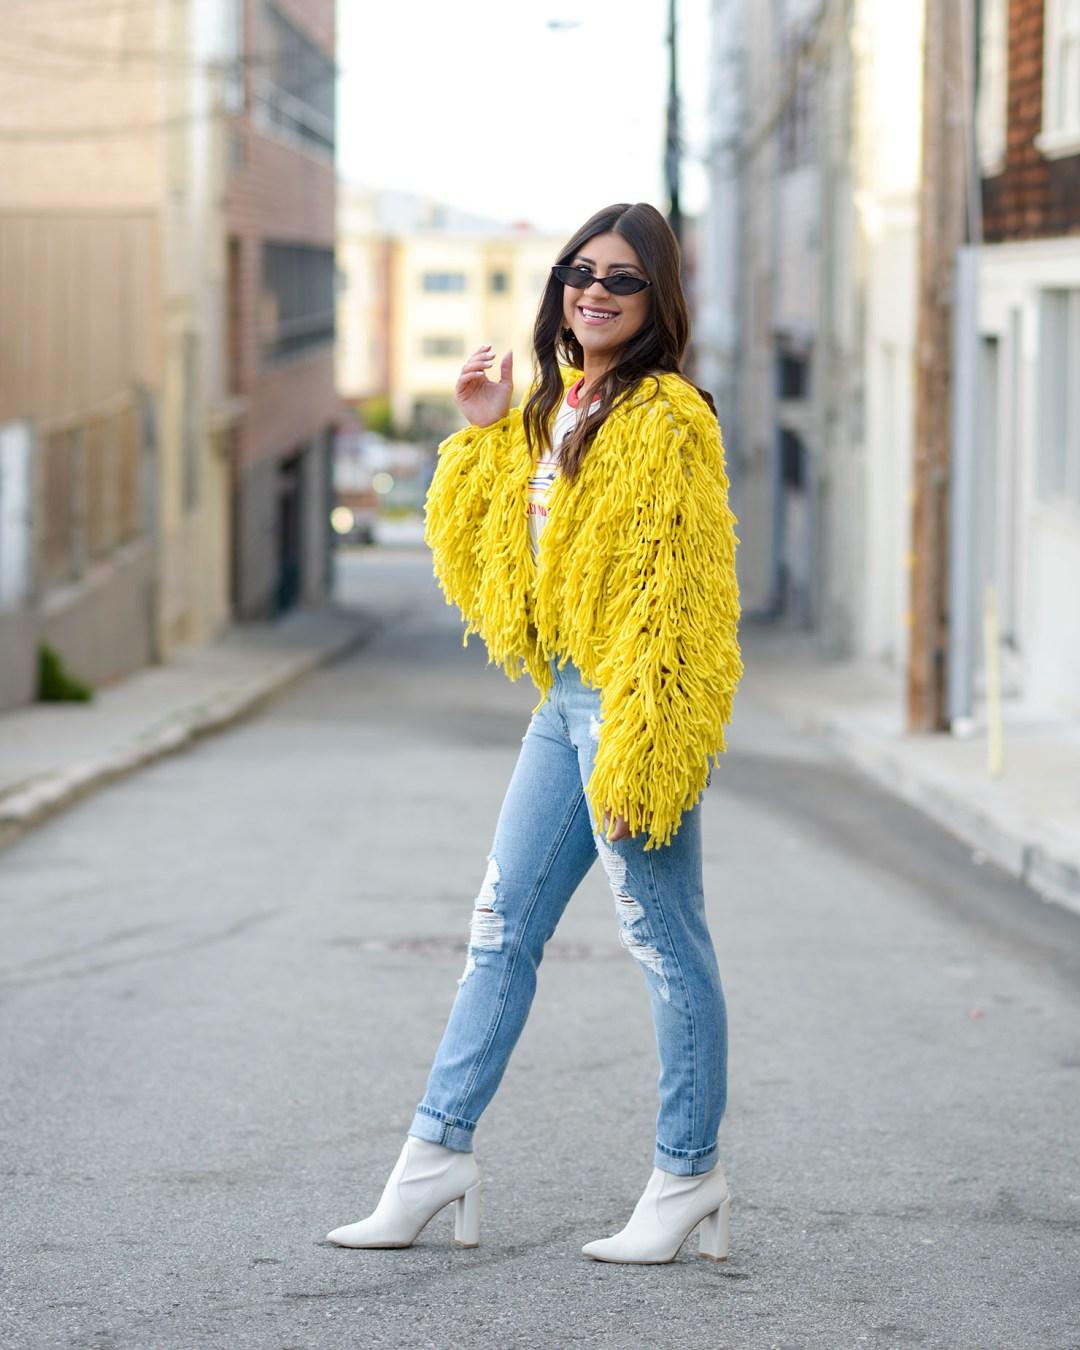 Lifestyle blogger Kelsey Kaplan of Kelsey Kaplan Fashion wearing mom jeans and small cat eye sunglasses